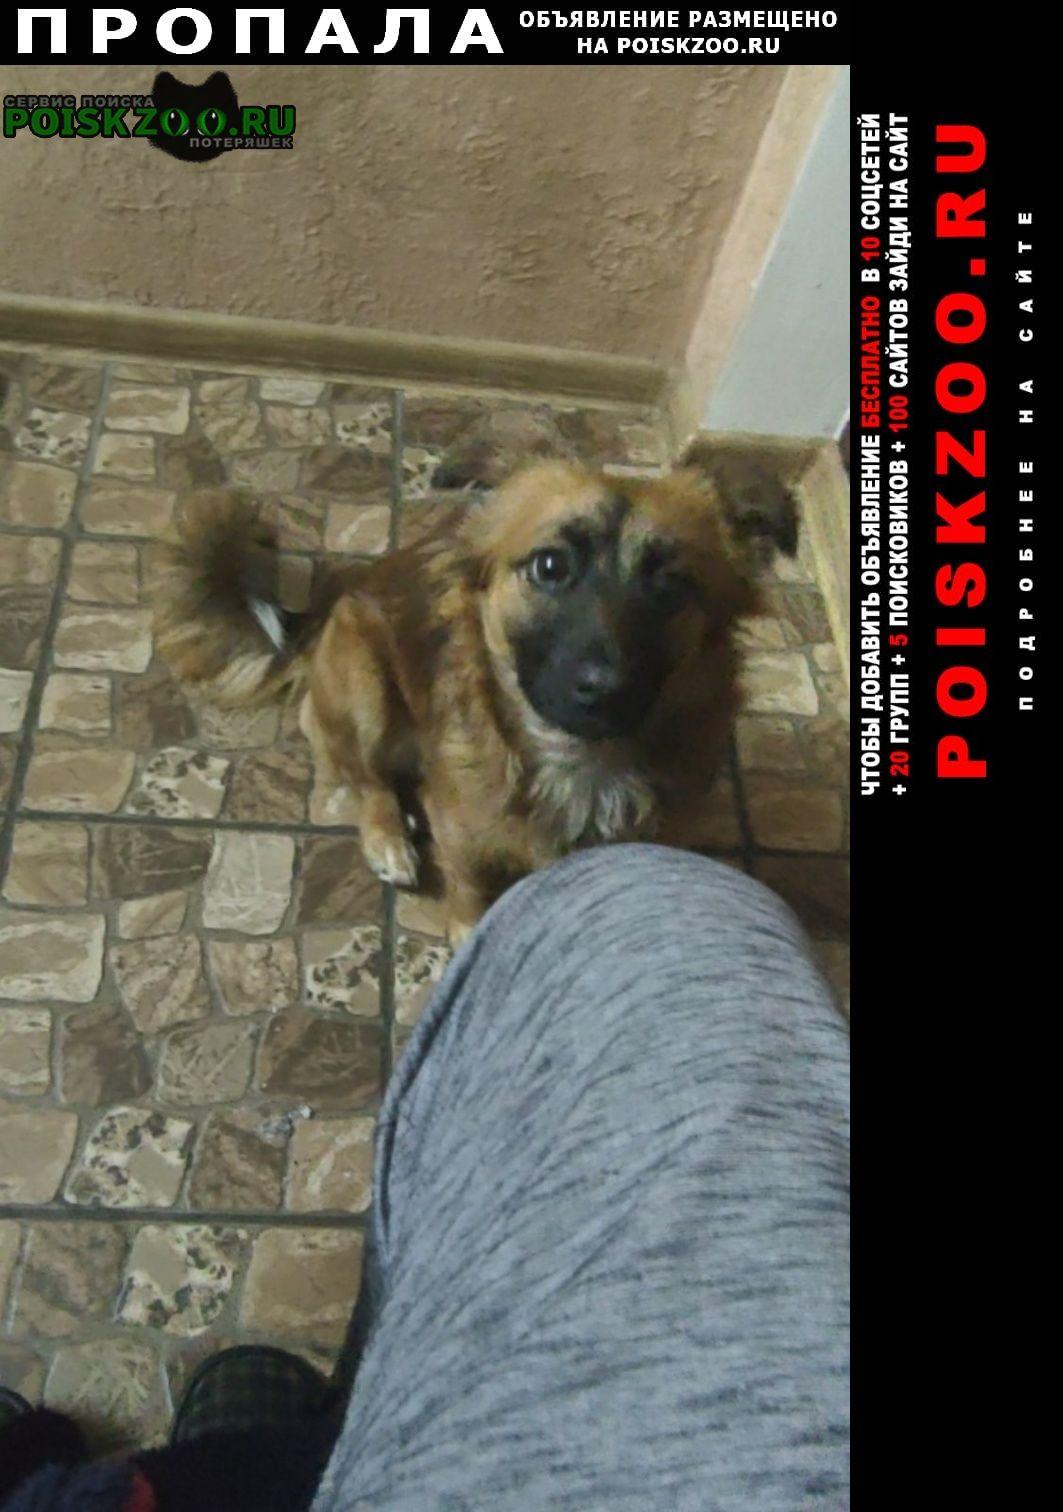 Пропала собака за вознаграждение Херсон